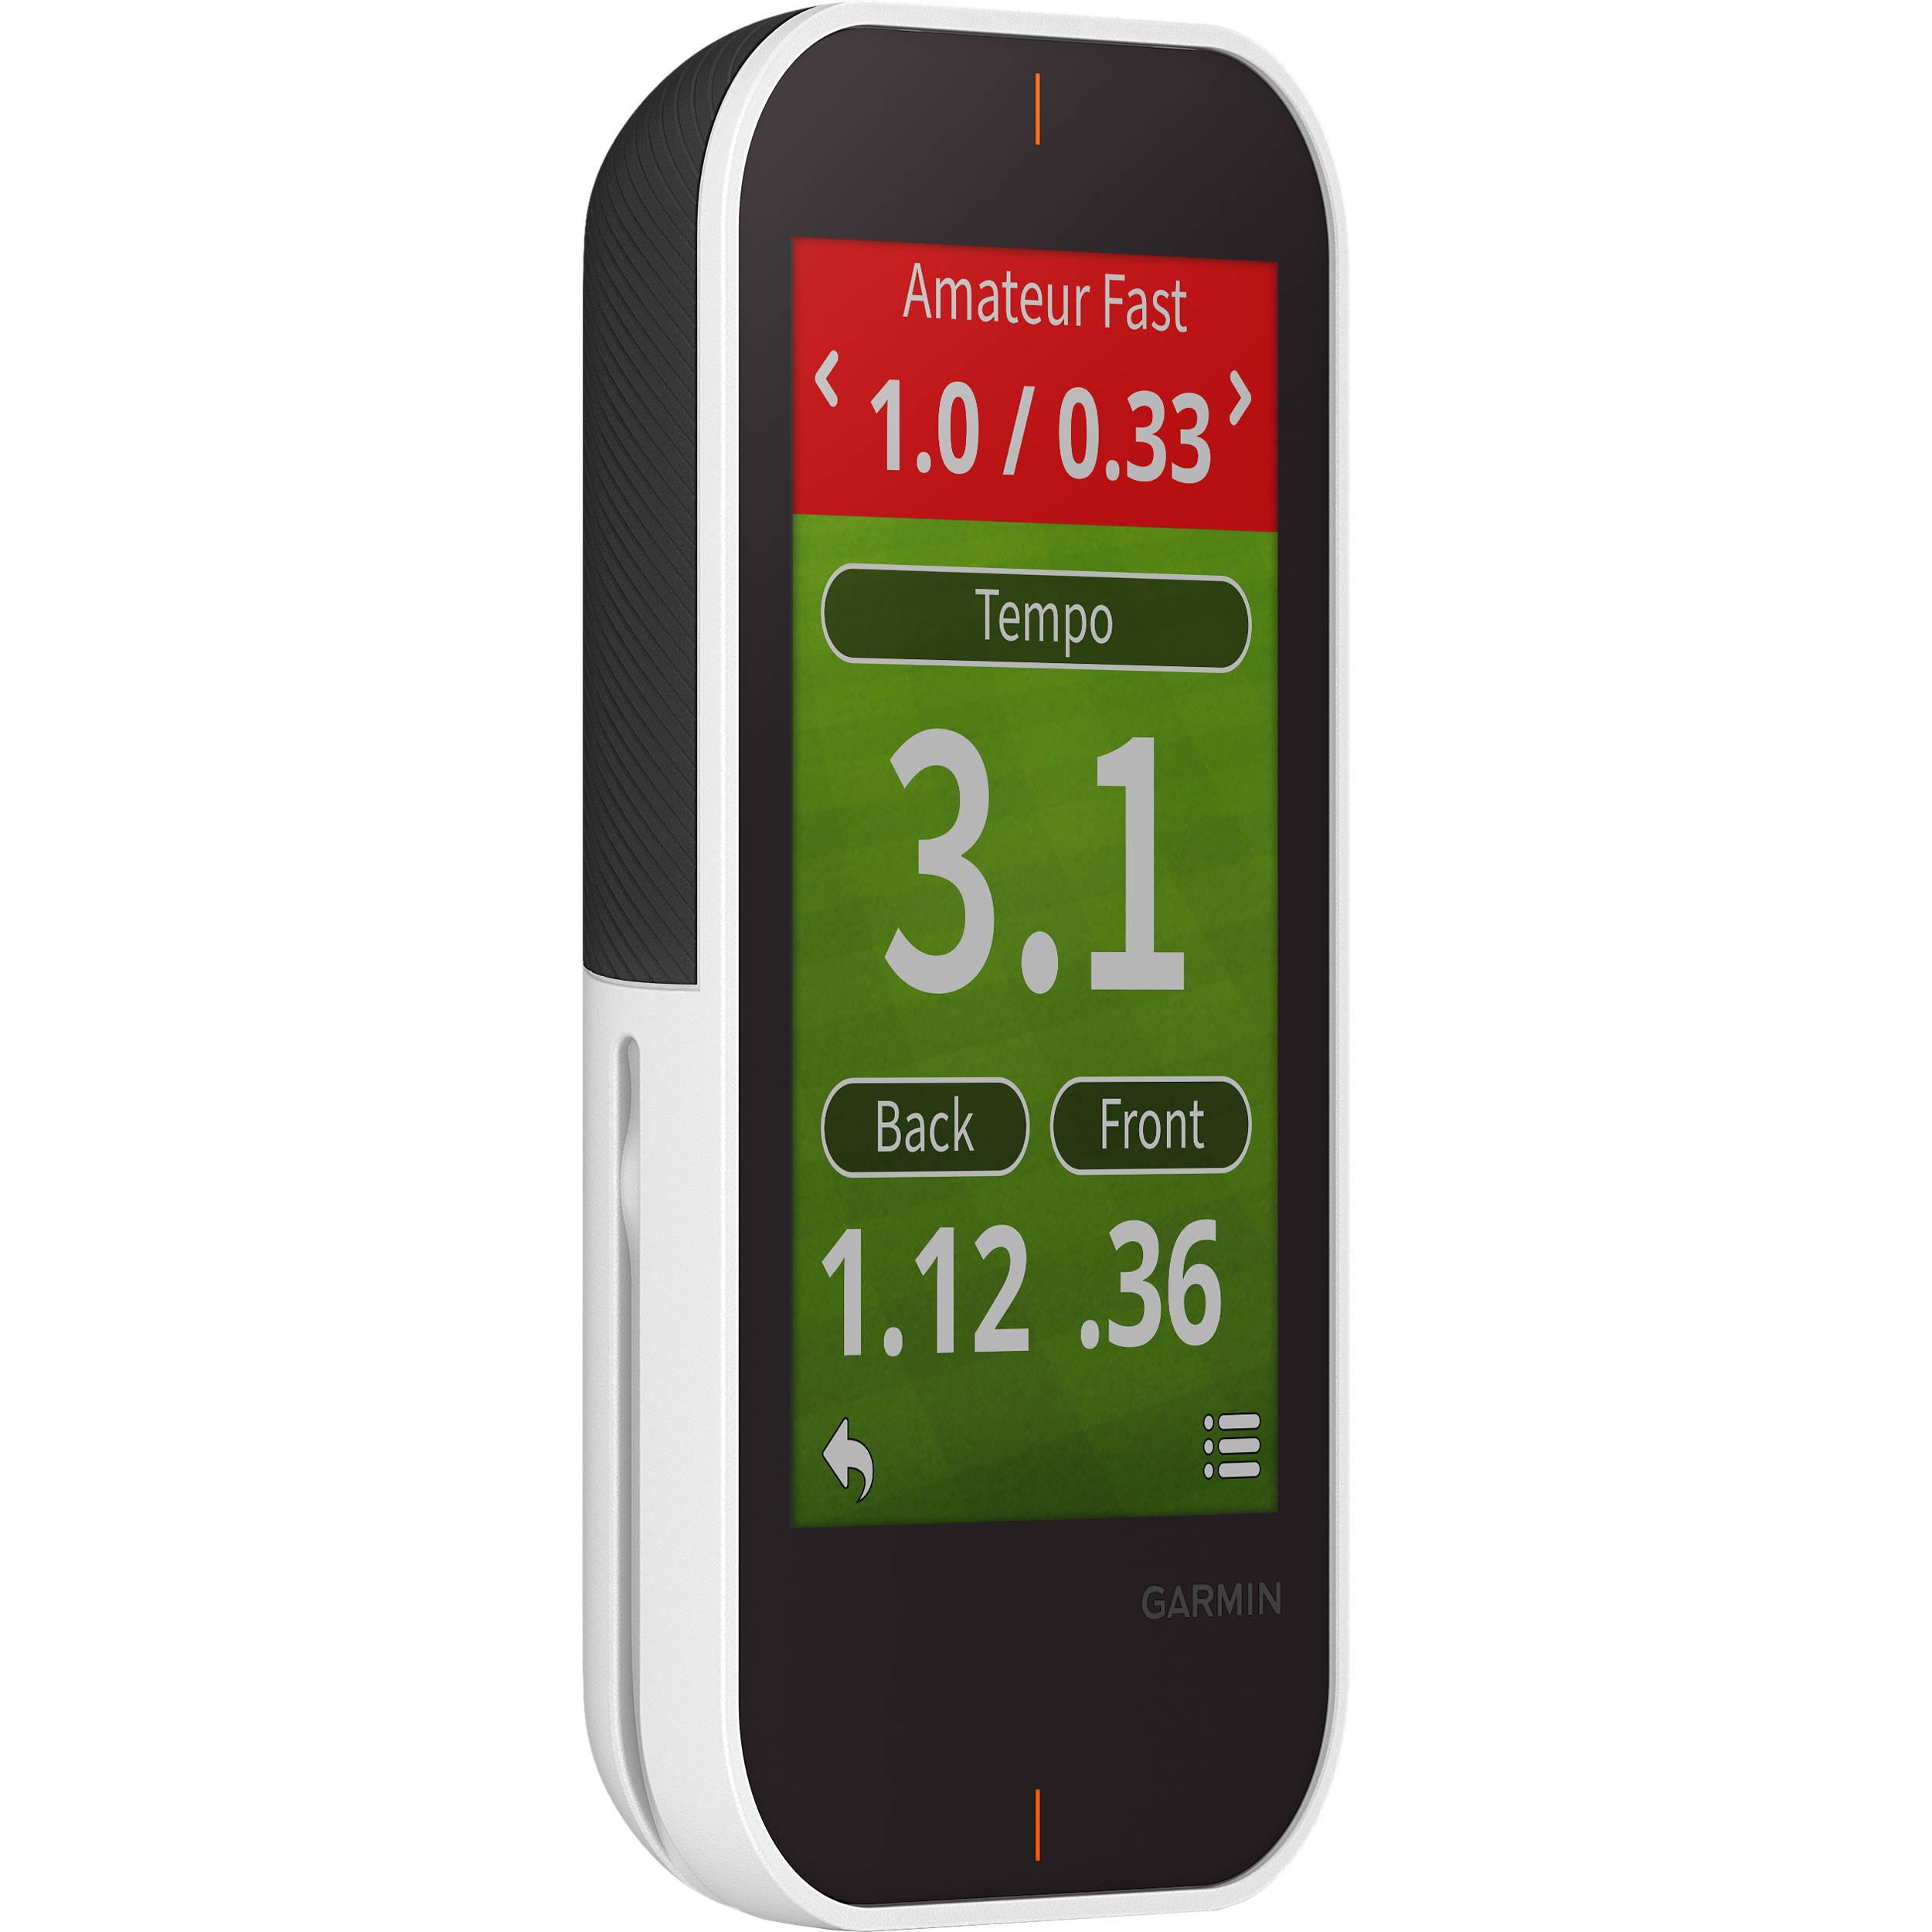 Garmin Approach G80 Handheld Golf GPS & Launch Monitor